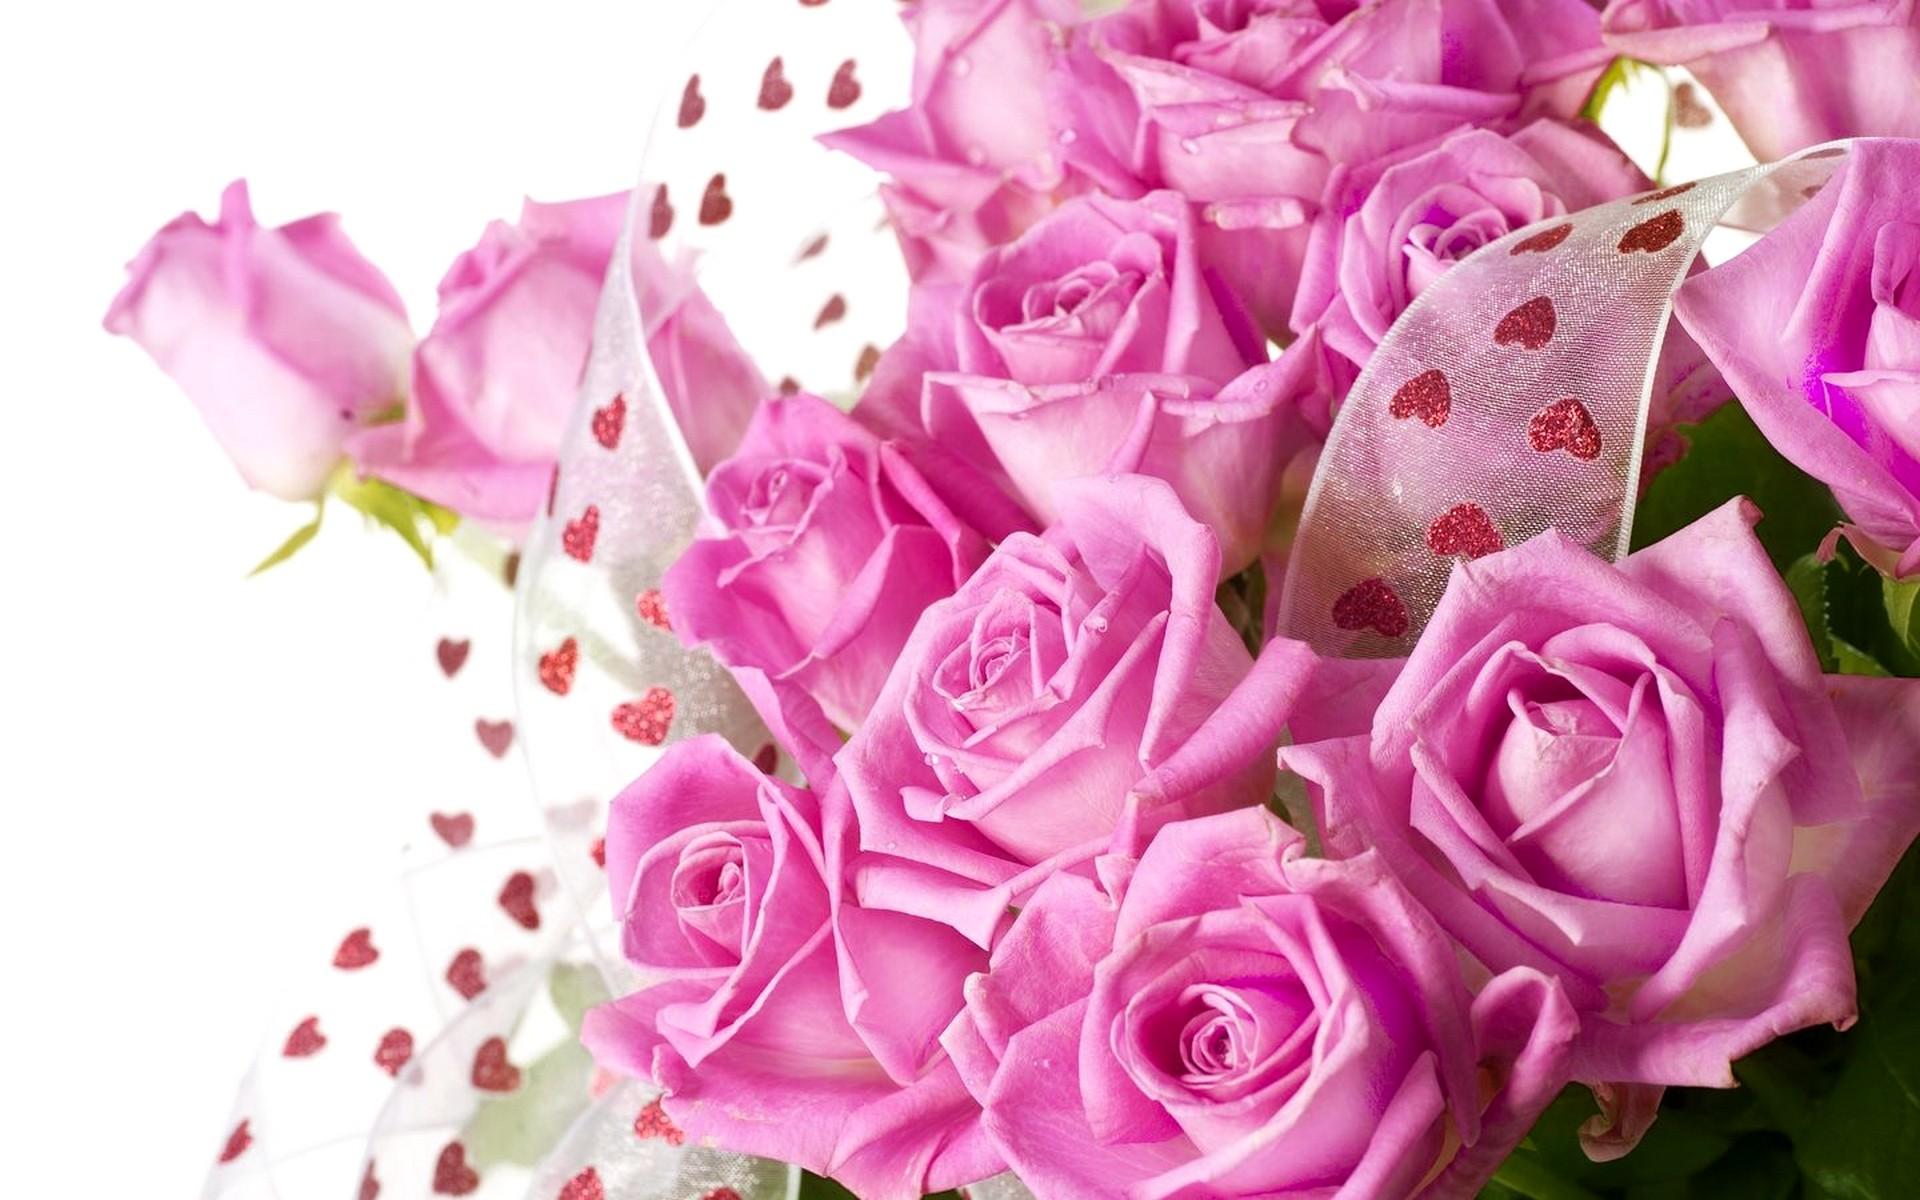 Beautiful roses wallpaper 48 images 2560x1600 beautiful flowers images free download beautiful red rose flower wallpaper izmirmasajfo